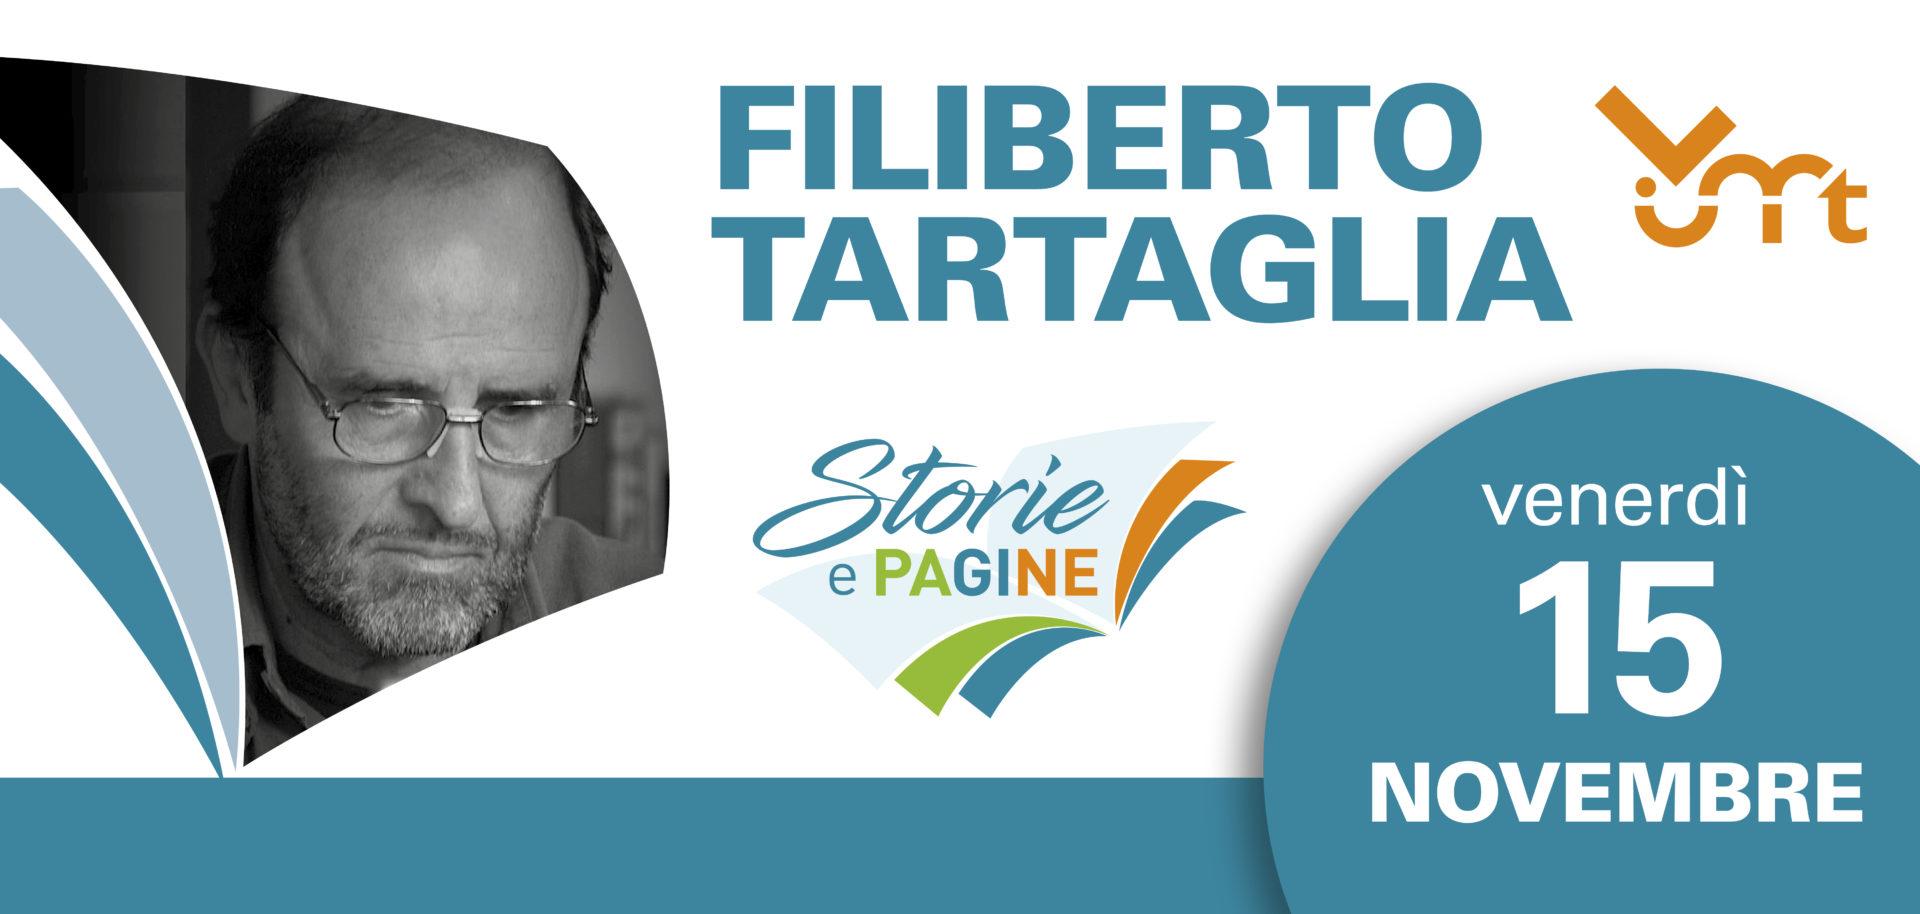 FILIBERTO TARTAGLIA